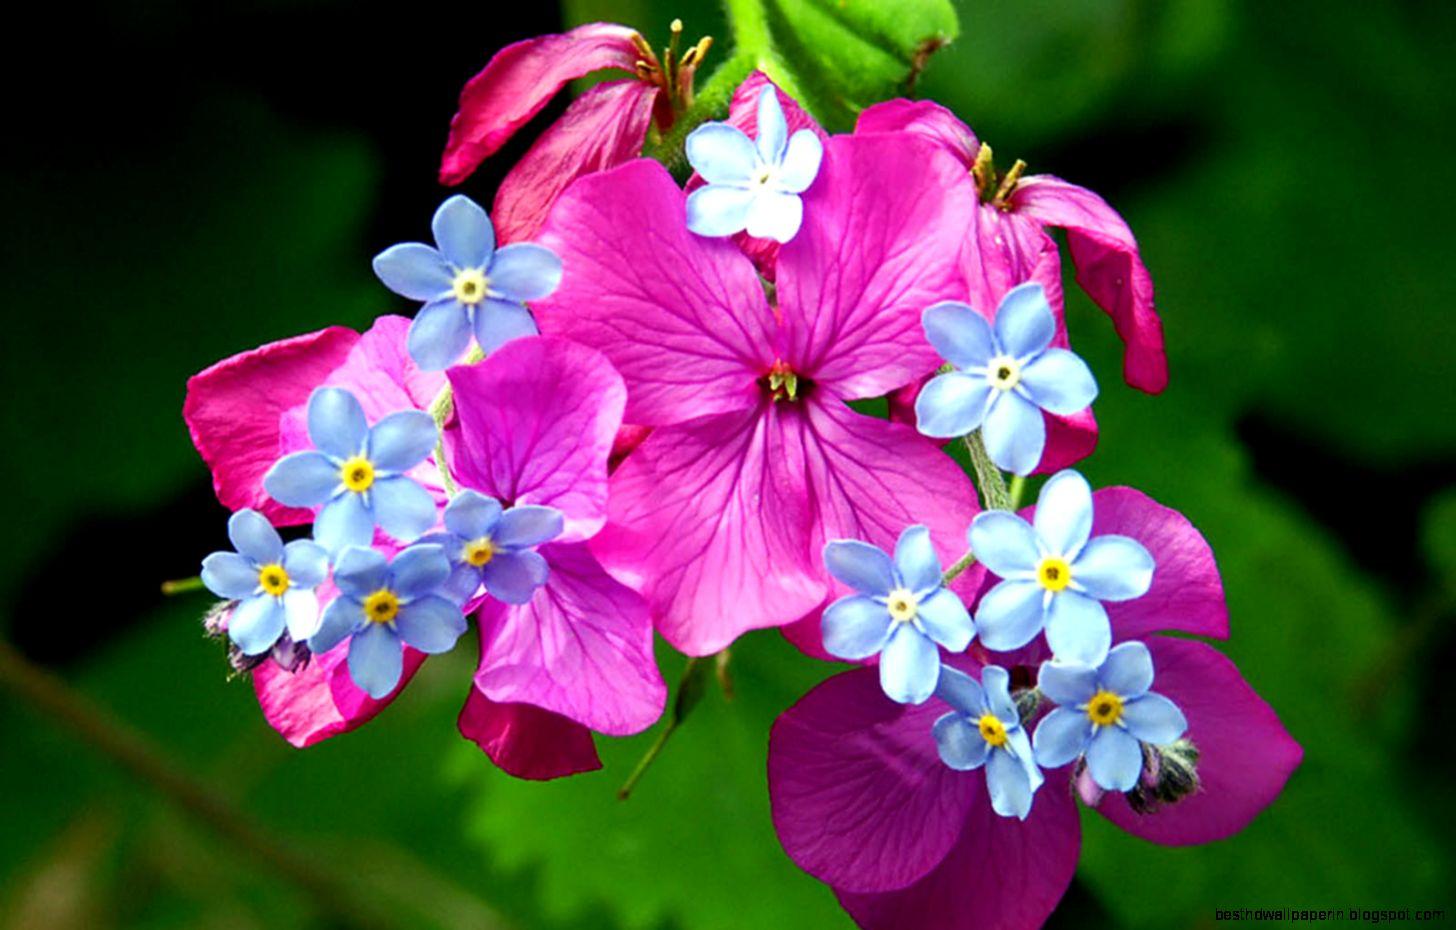 Spring Flower Desktop Background Best Hd Wallpapers